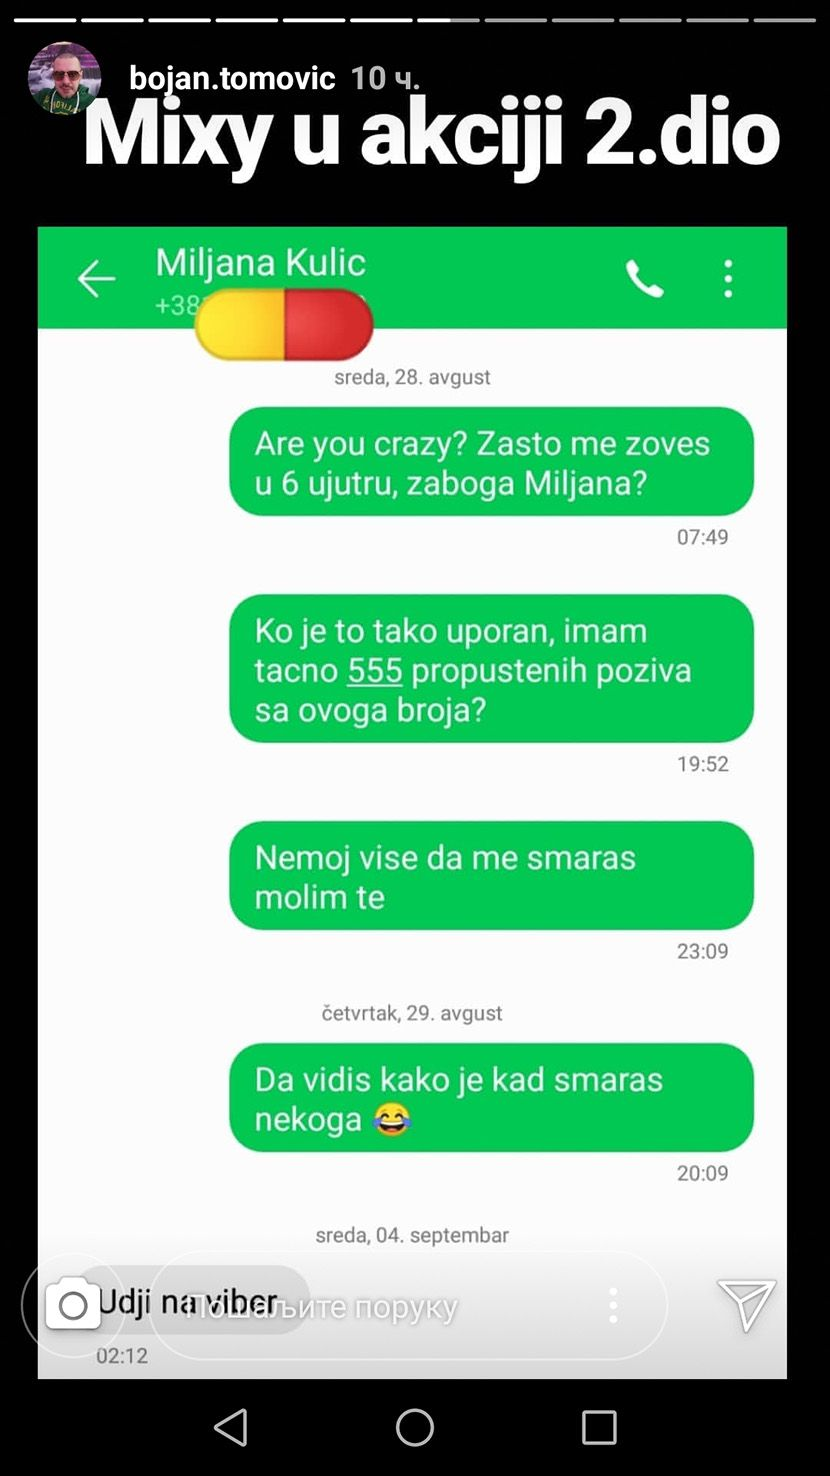 Bojan Tomovic, Miljana Kulic